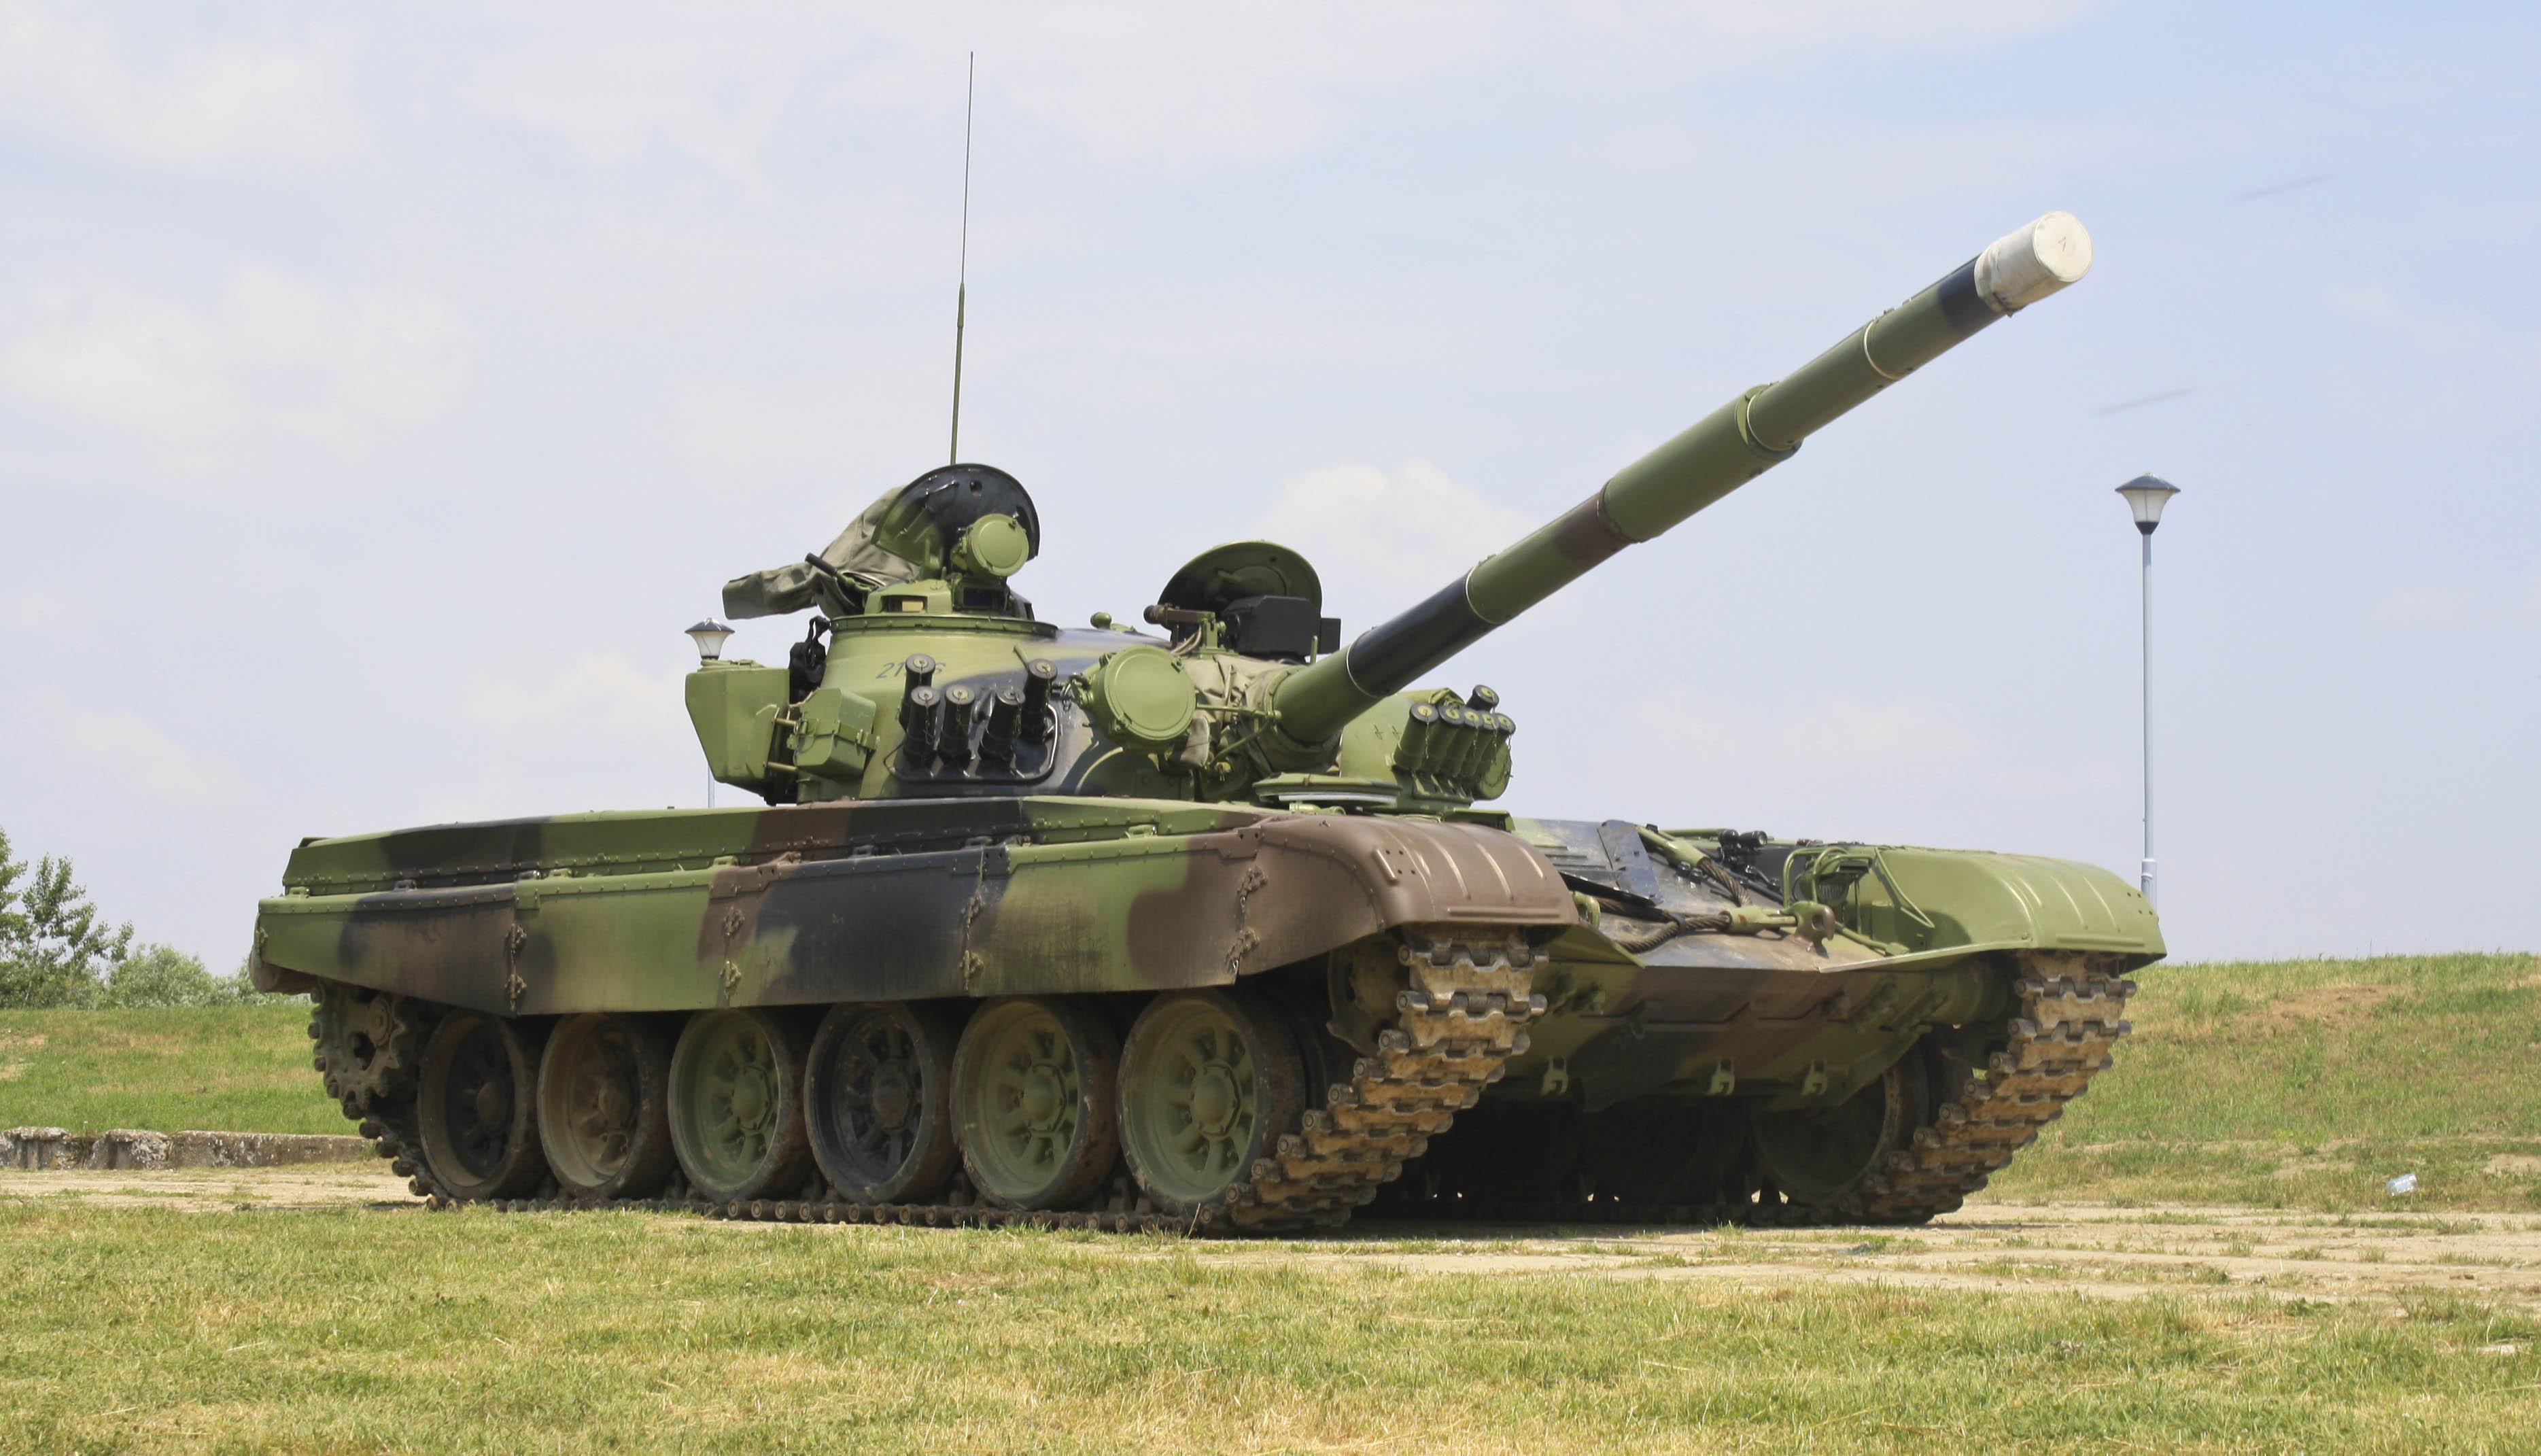 танк Т-72 - М-84